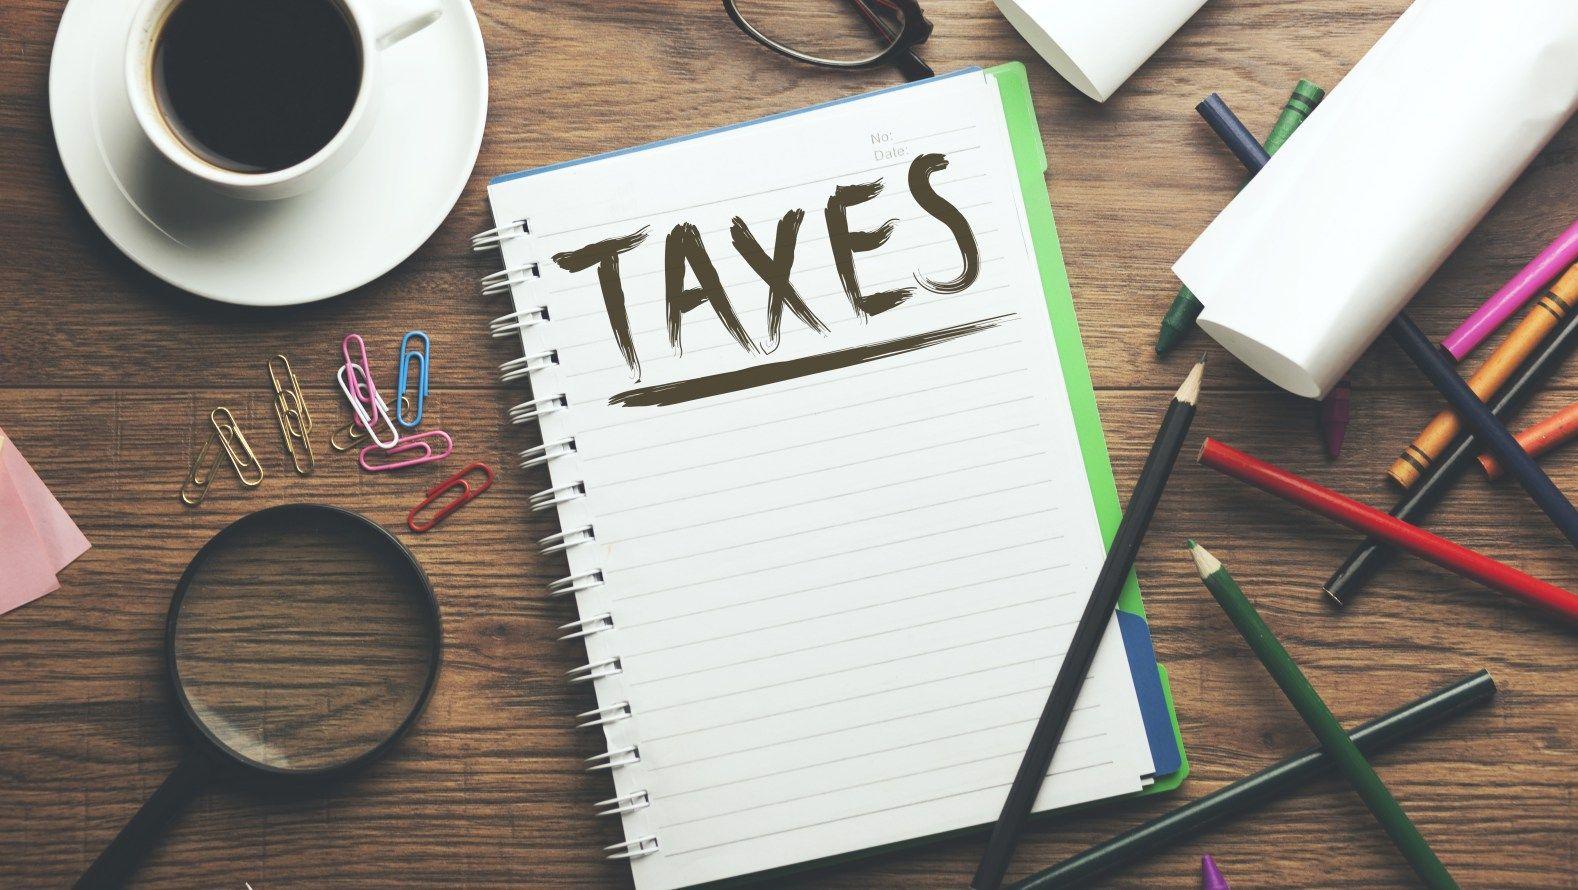 Free irs tax help begins friday tax help money matters